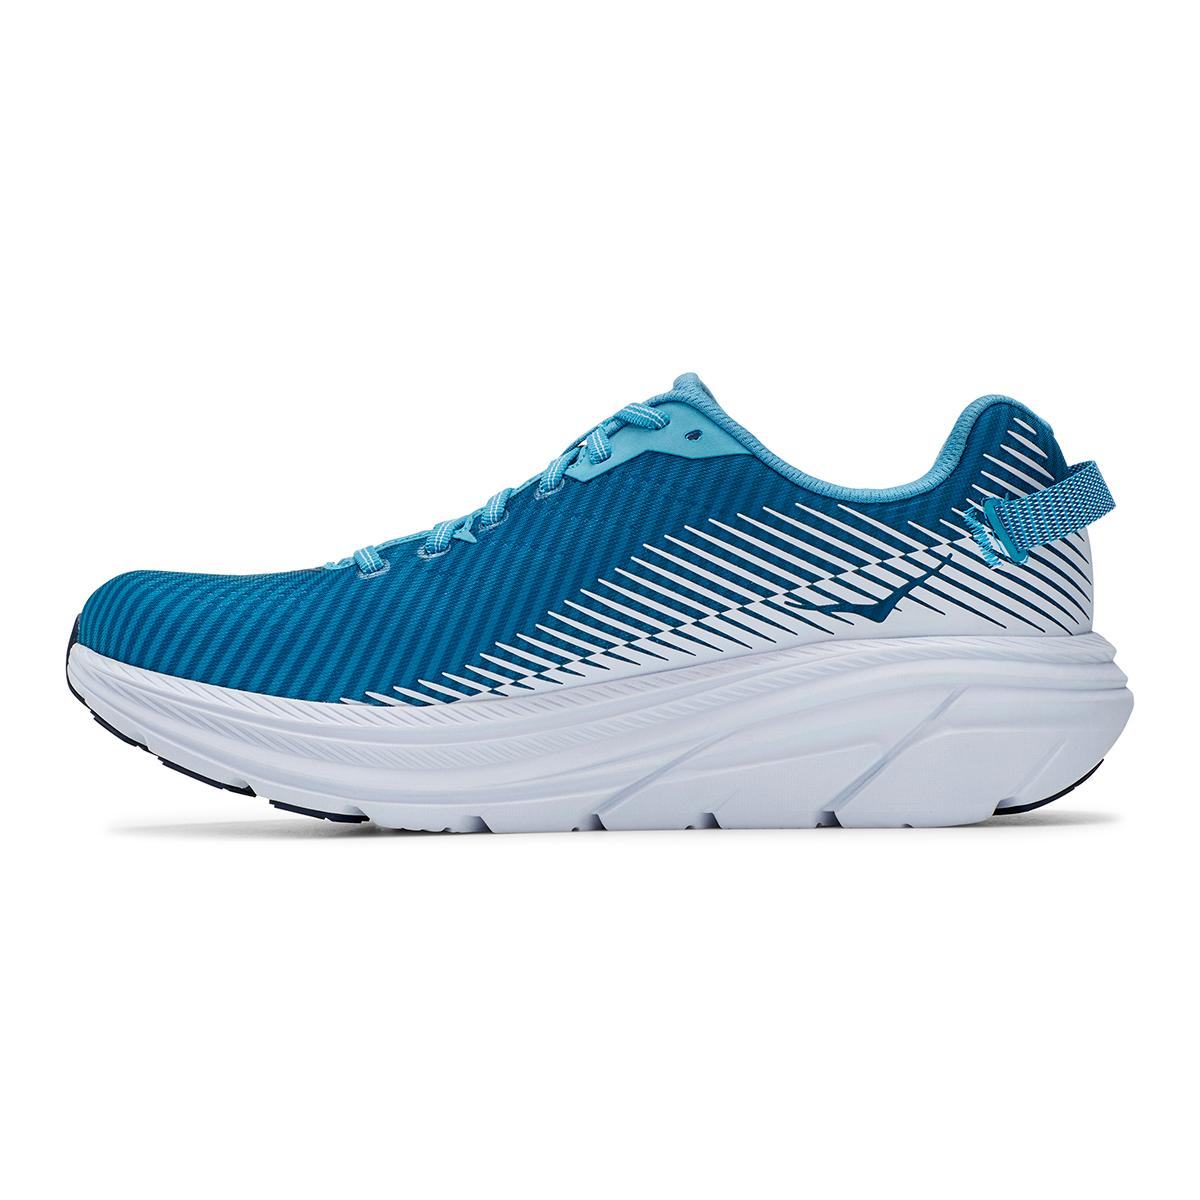 Men's Hoka One One Rincon 2 Running Shoe - Color: Blue Moon/White - Size: 7 - Width: Regular, Blue Moon/White, large, image 6